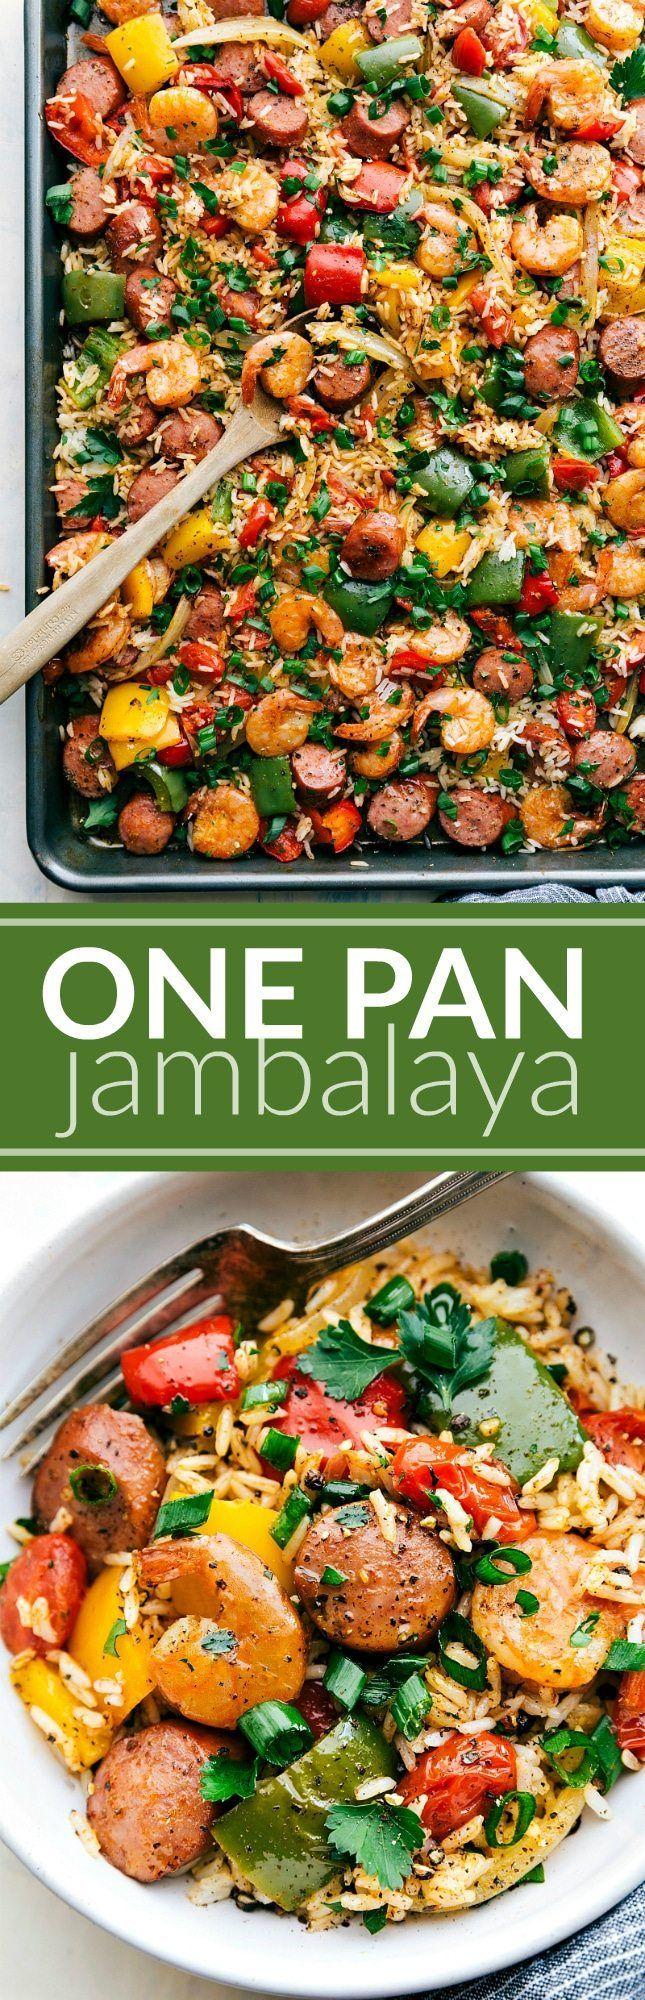 One Pan Jambalaya | Chelsea's Messy Apron